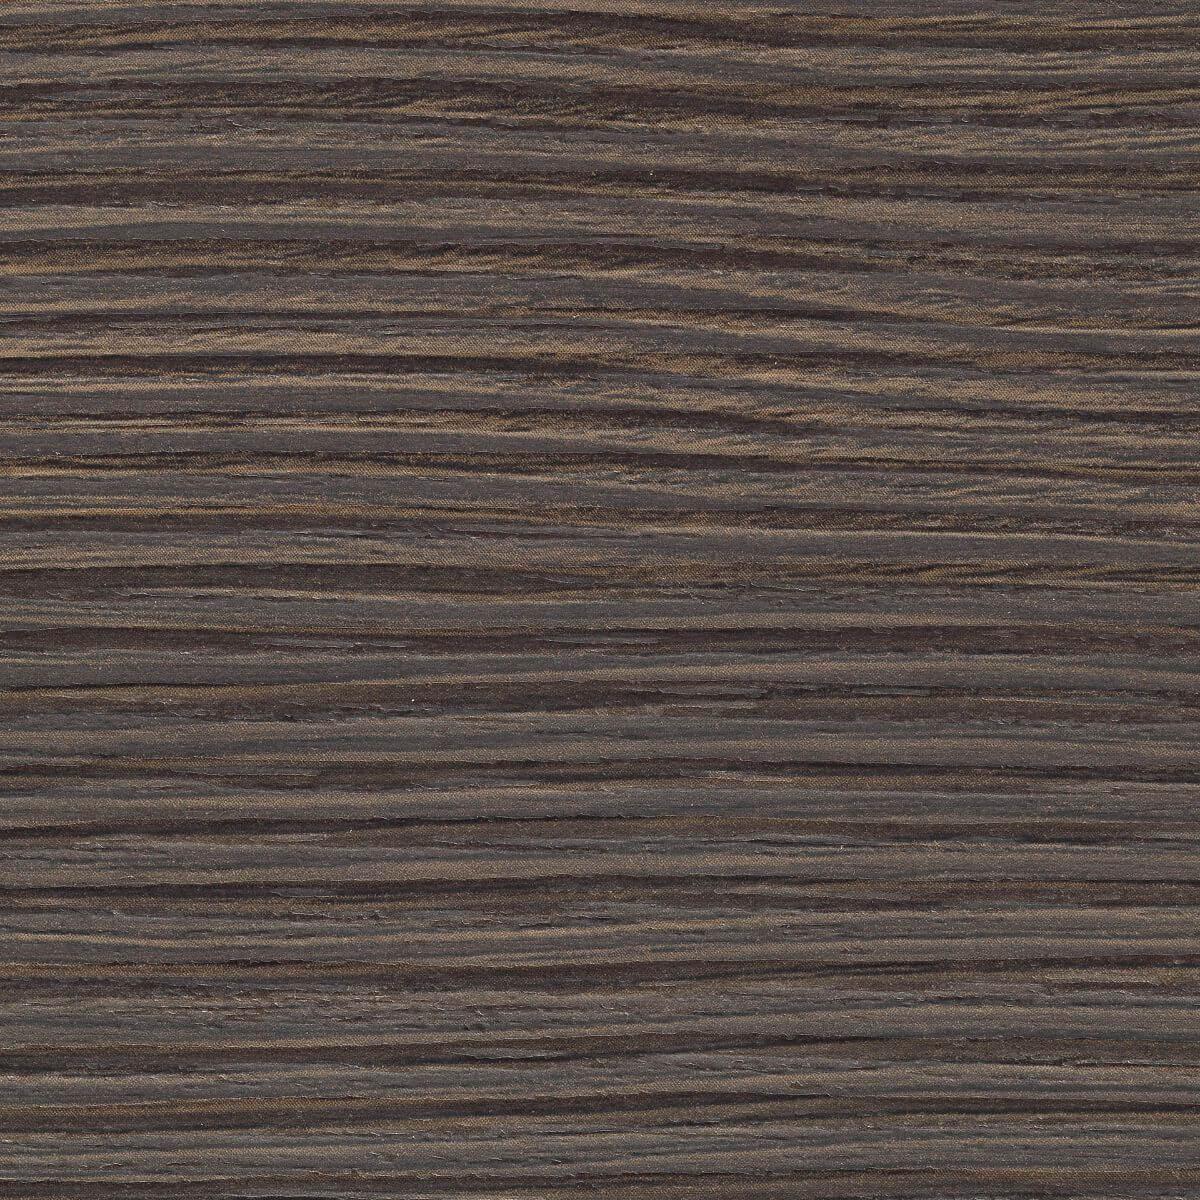 Finish wood oregon pine matrix for glass wall